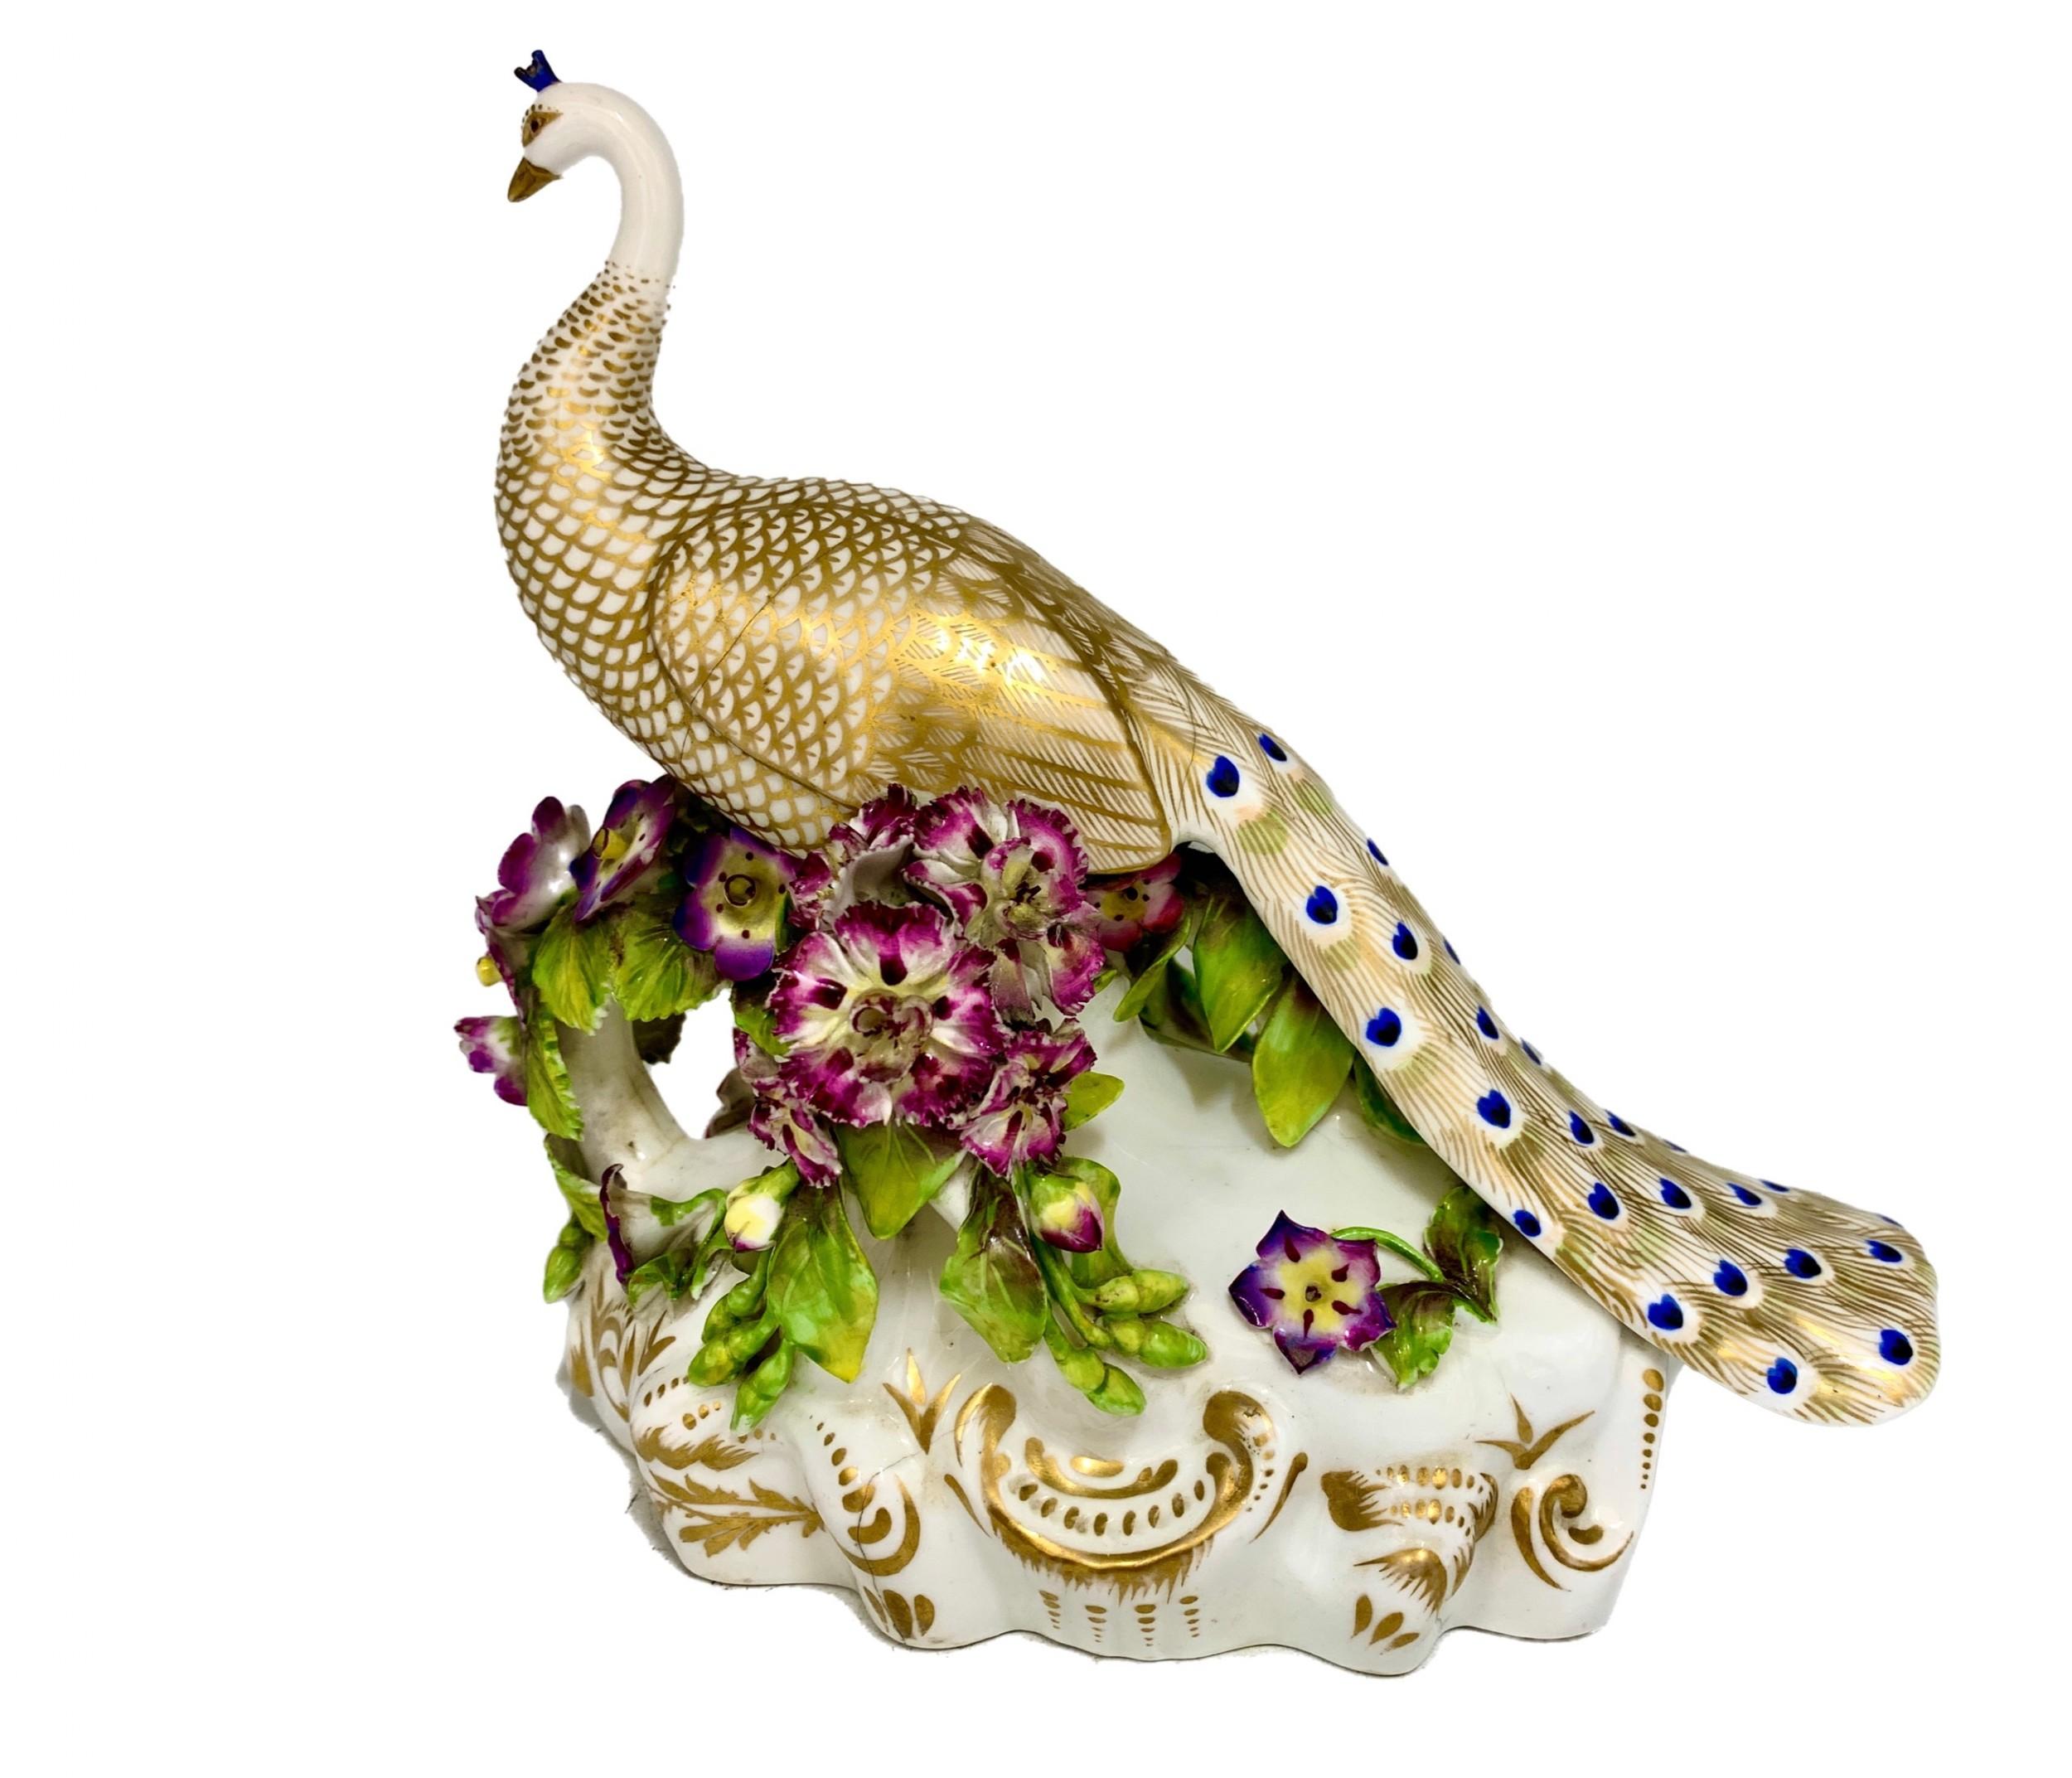 antique stevenson hancock derby porcelain peacock figurine circa 1865